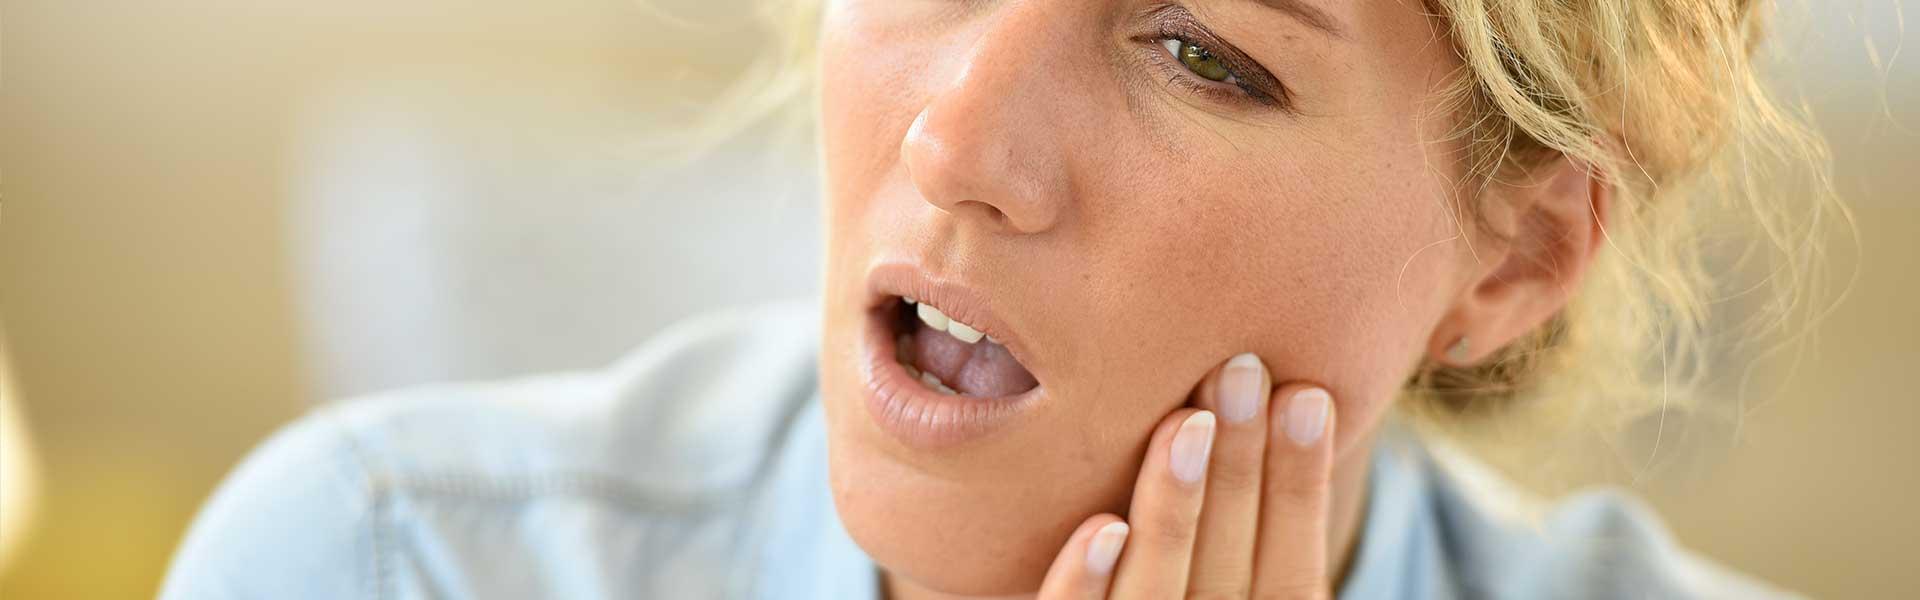 NE Calgary TMJ Therapy | Pathways Dental Clinic